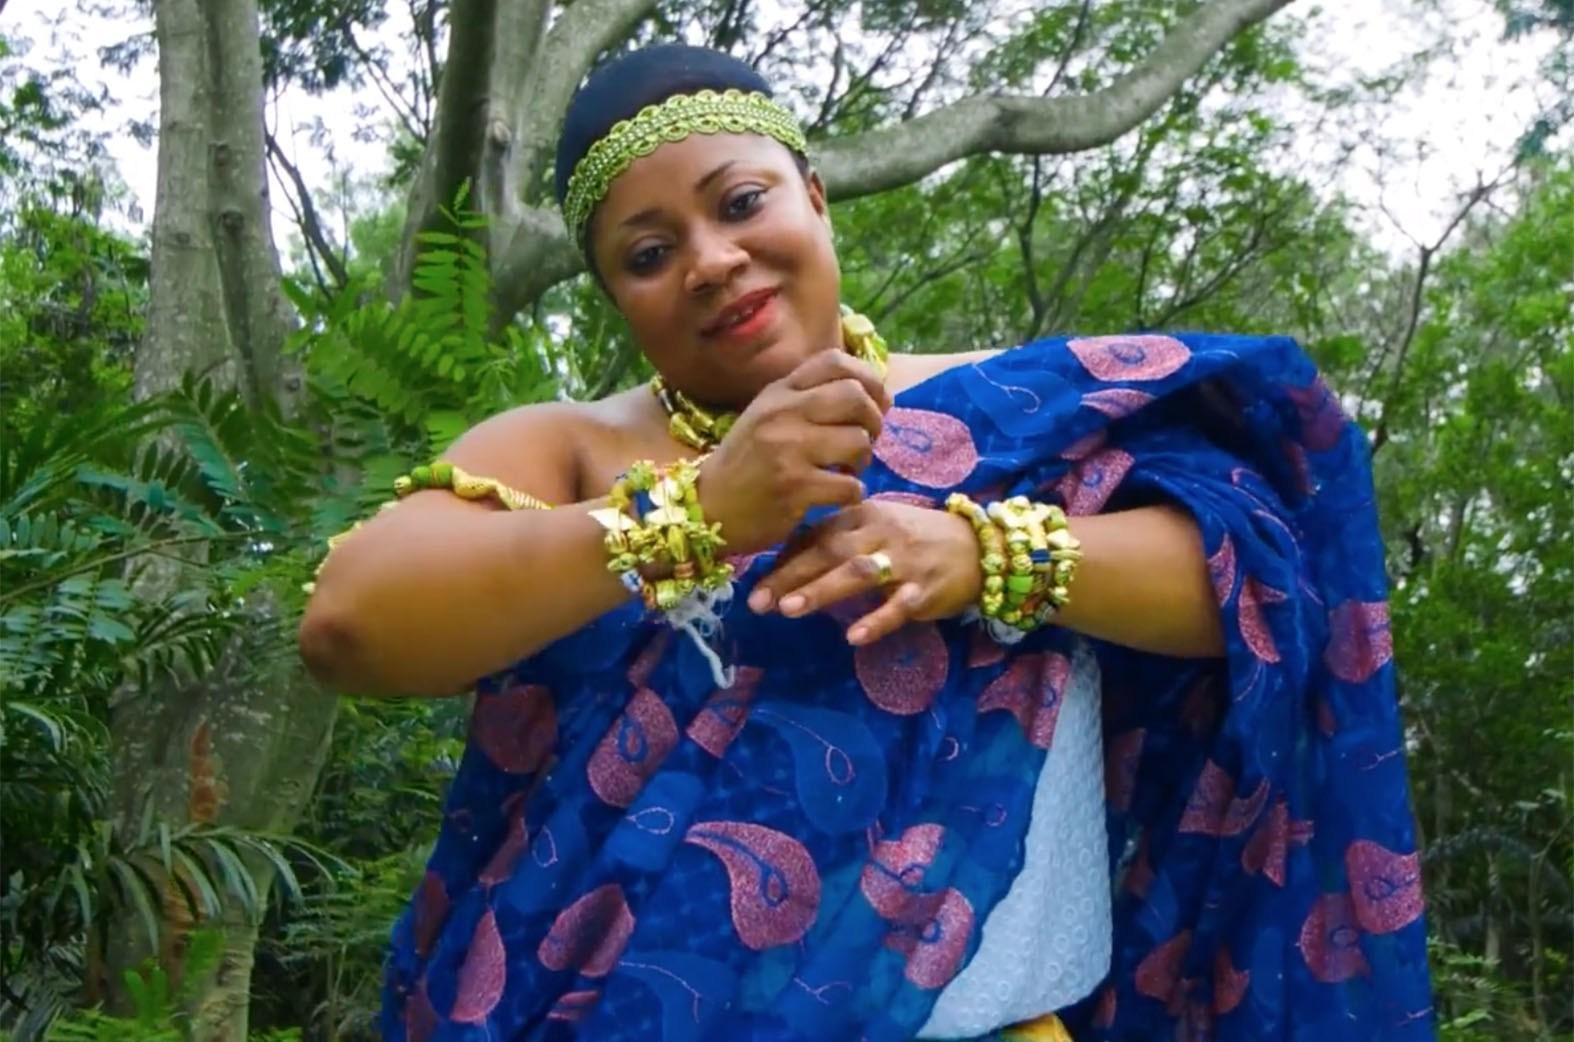 Legalizing 'Payola' will help musicians - Gospel musician